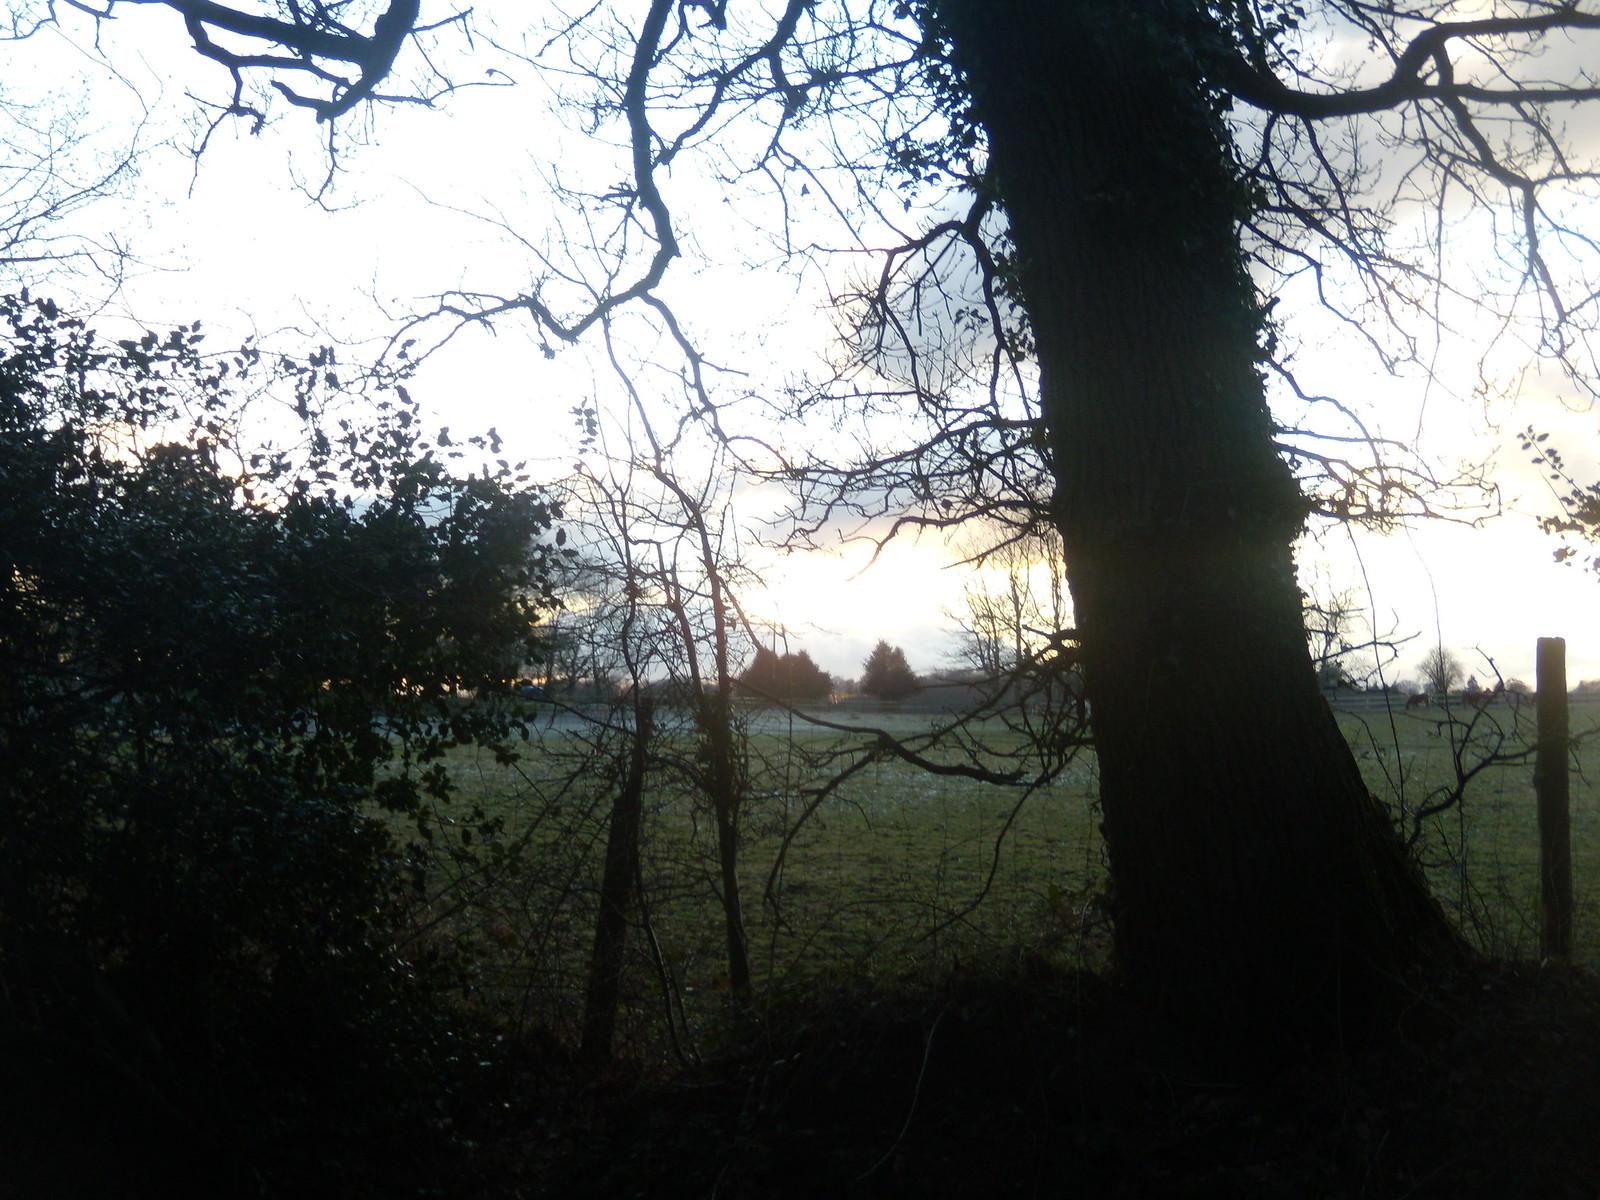 Tree silhouette DSCN8330 Haslemere Round Walk